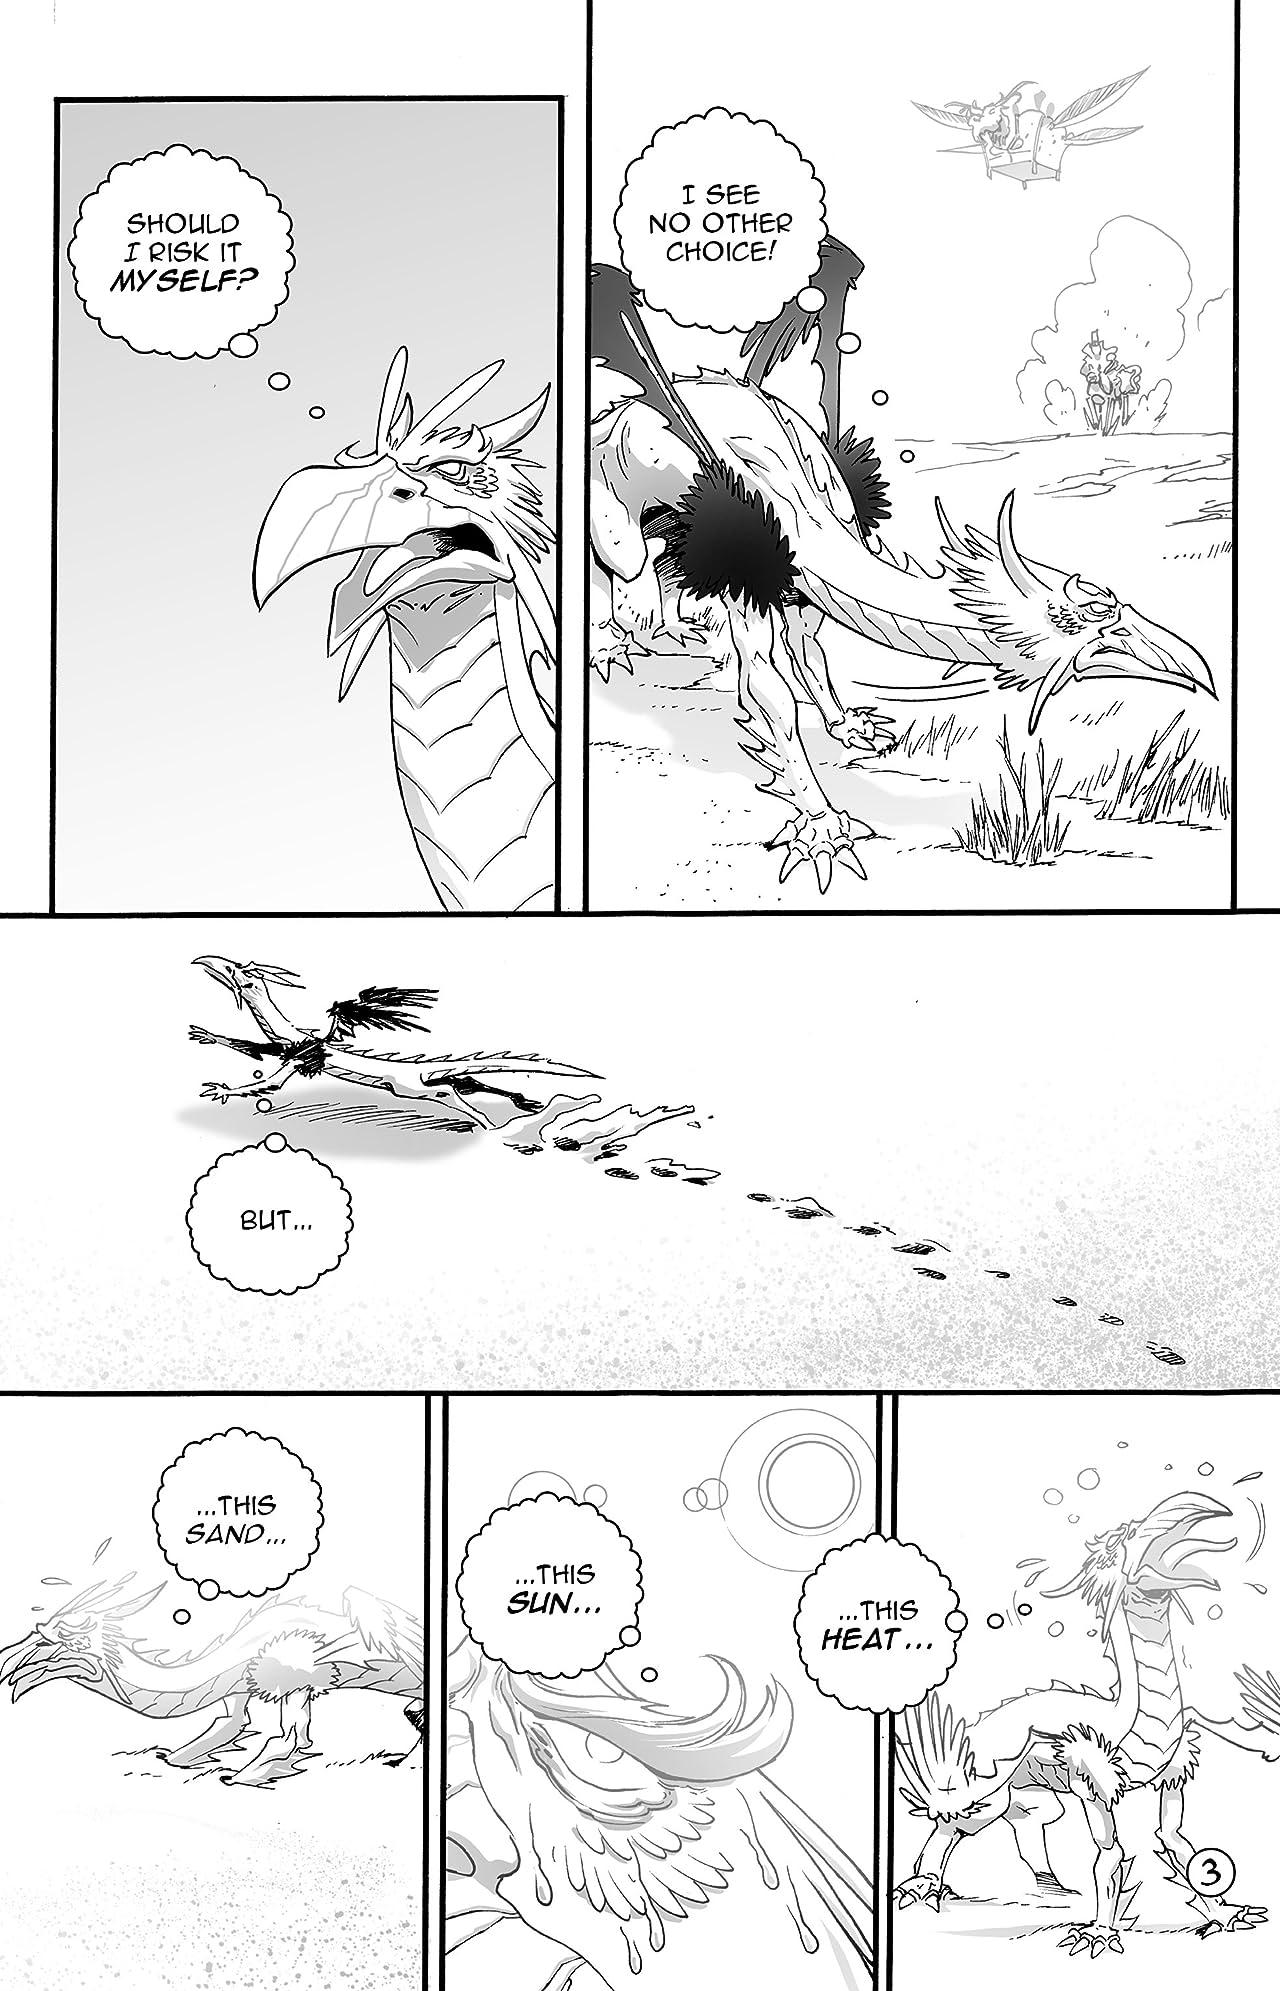 The Land of Oz: The Manga #8 (of 8)